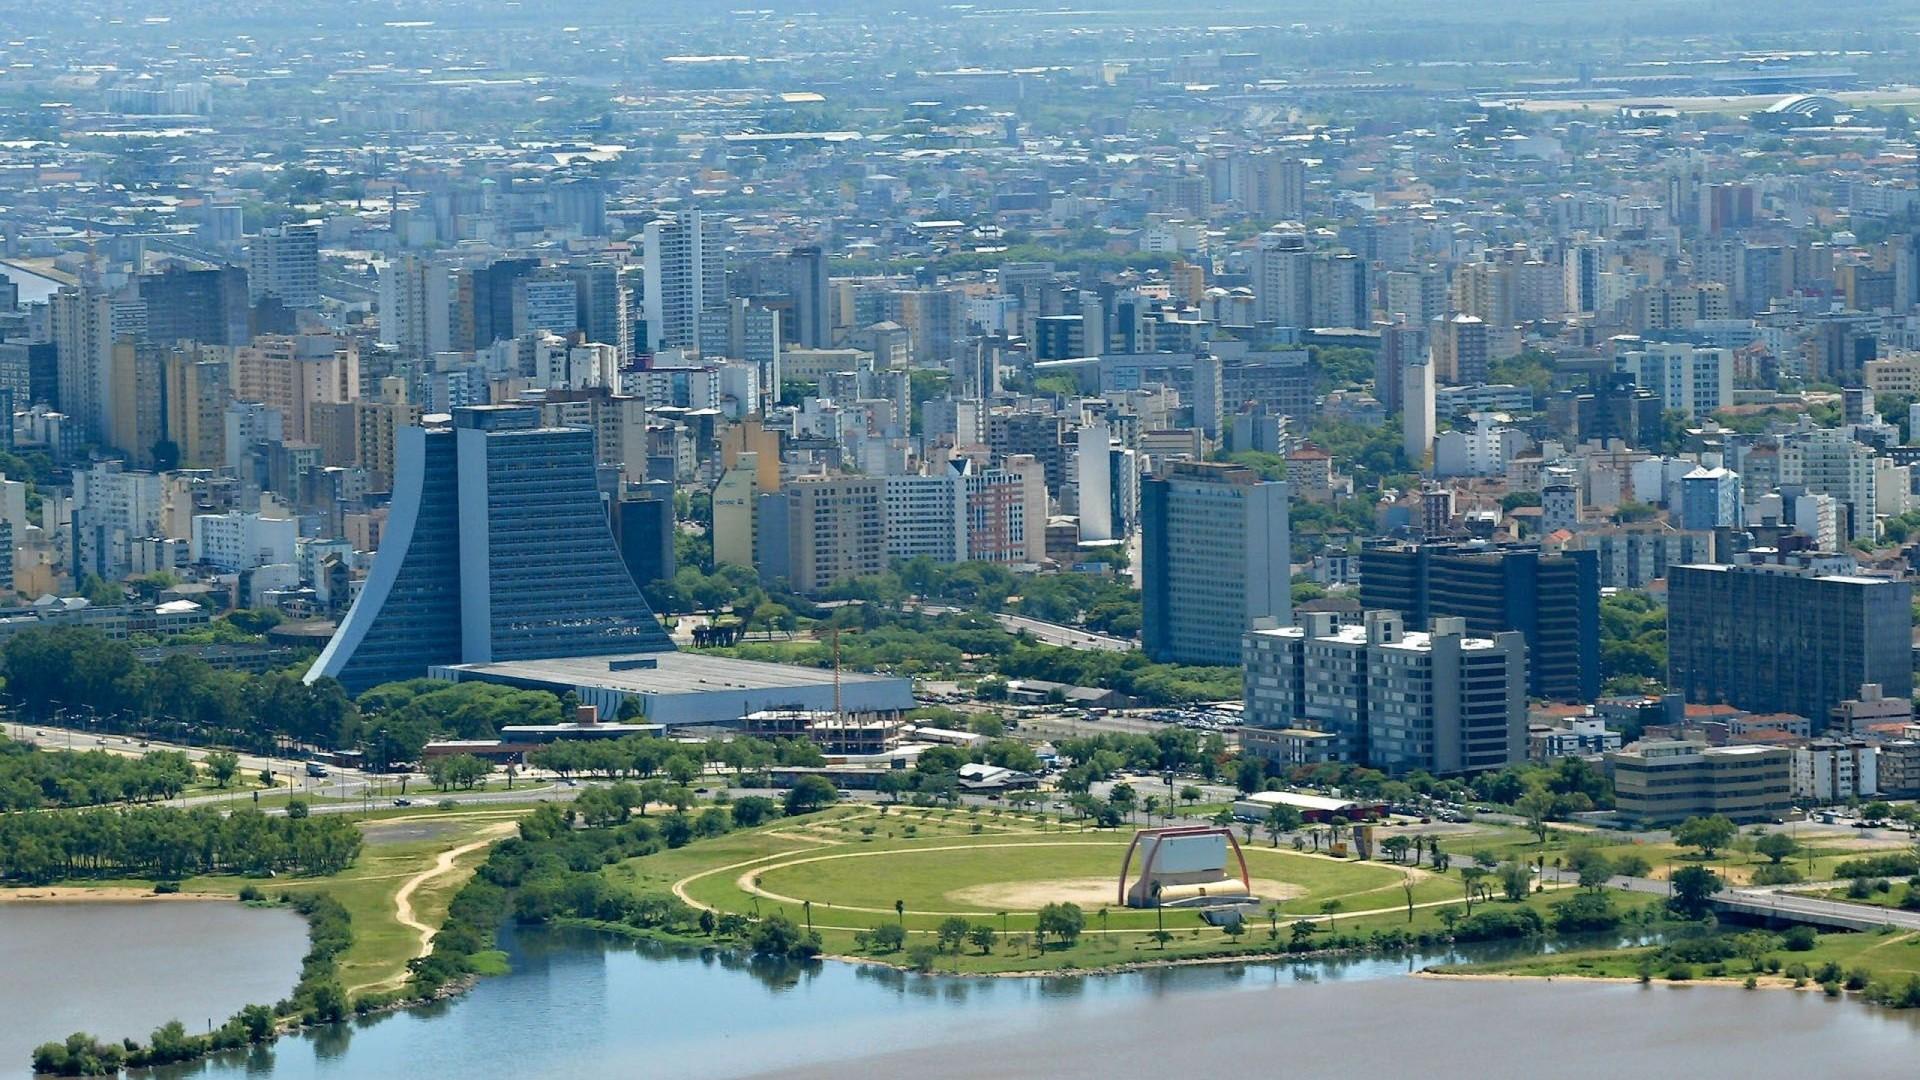 experience in porto alegre brazil by marcelo erasmus